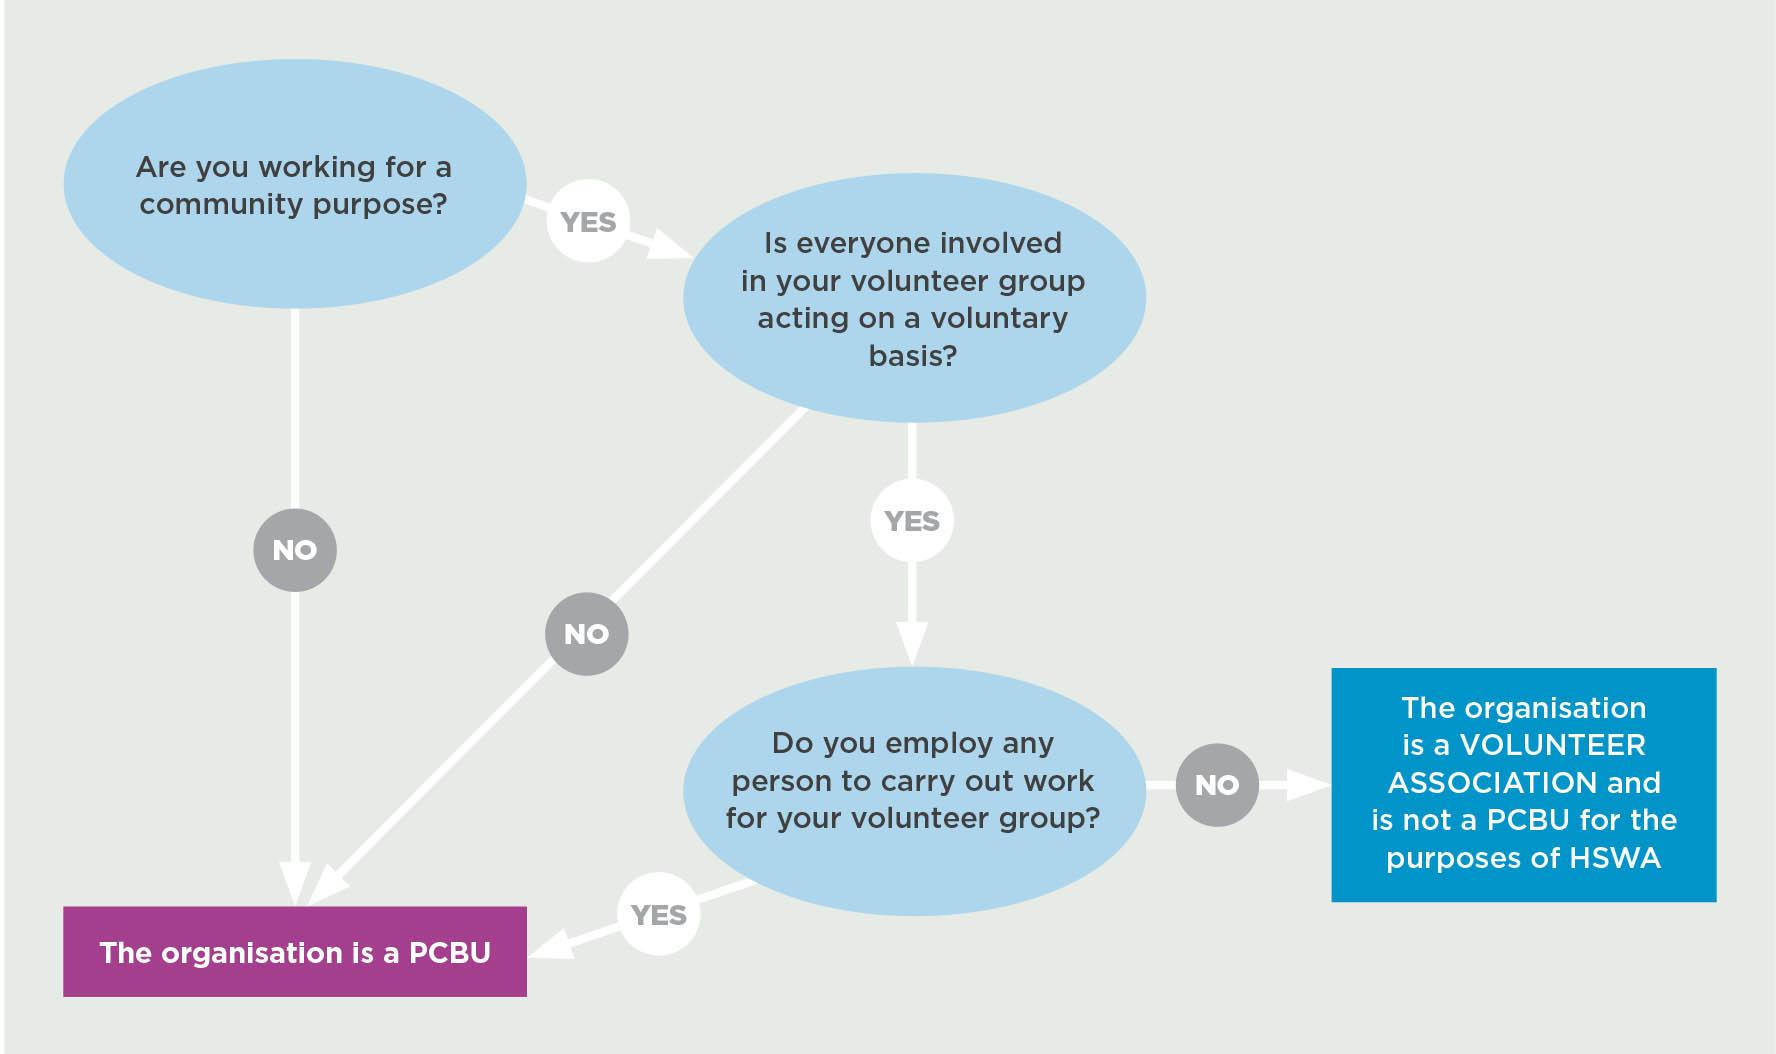 hight resolution of figure 1 pcbu or volunteer association